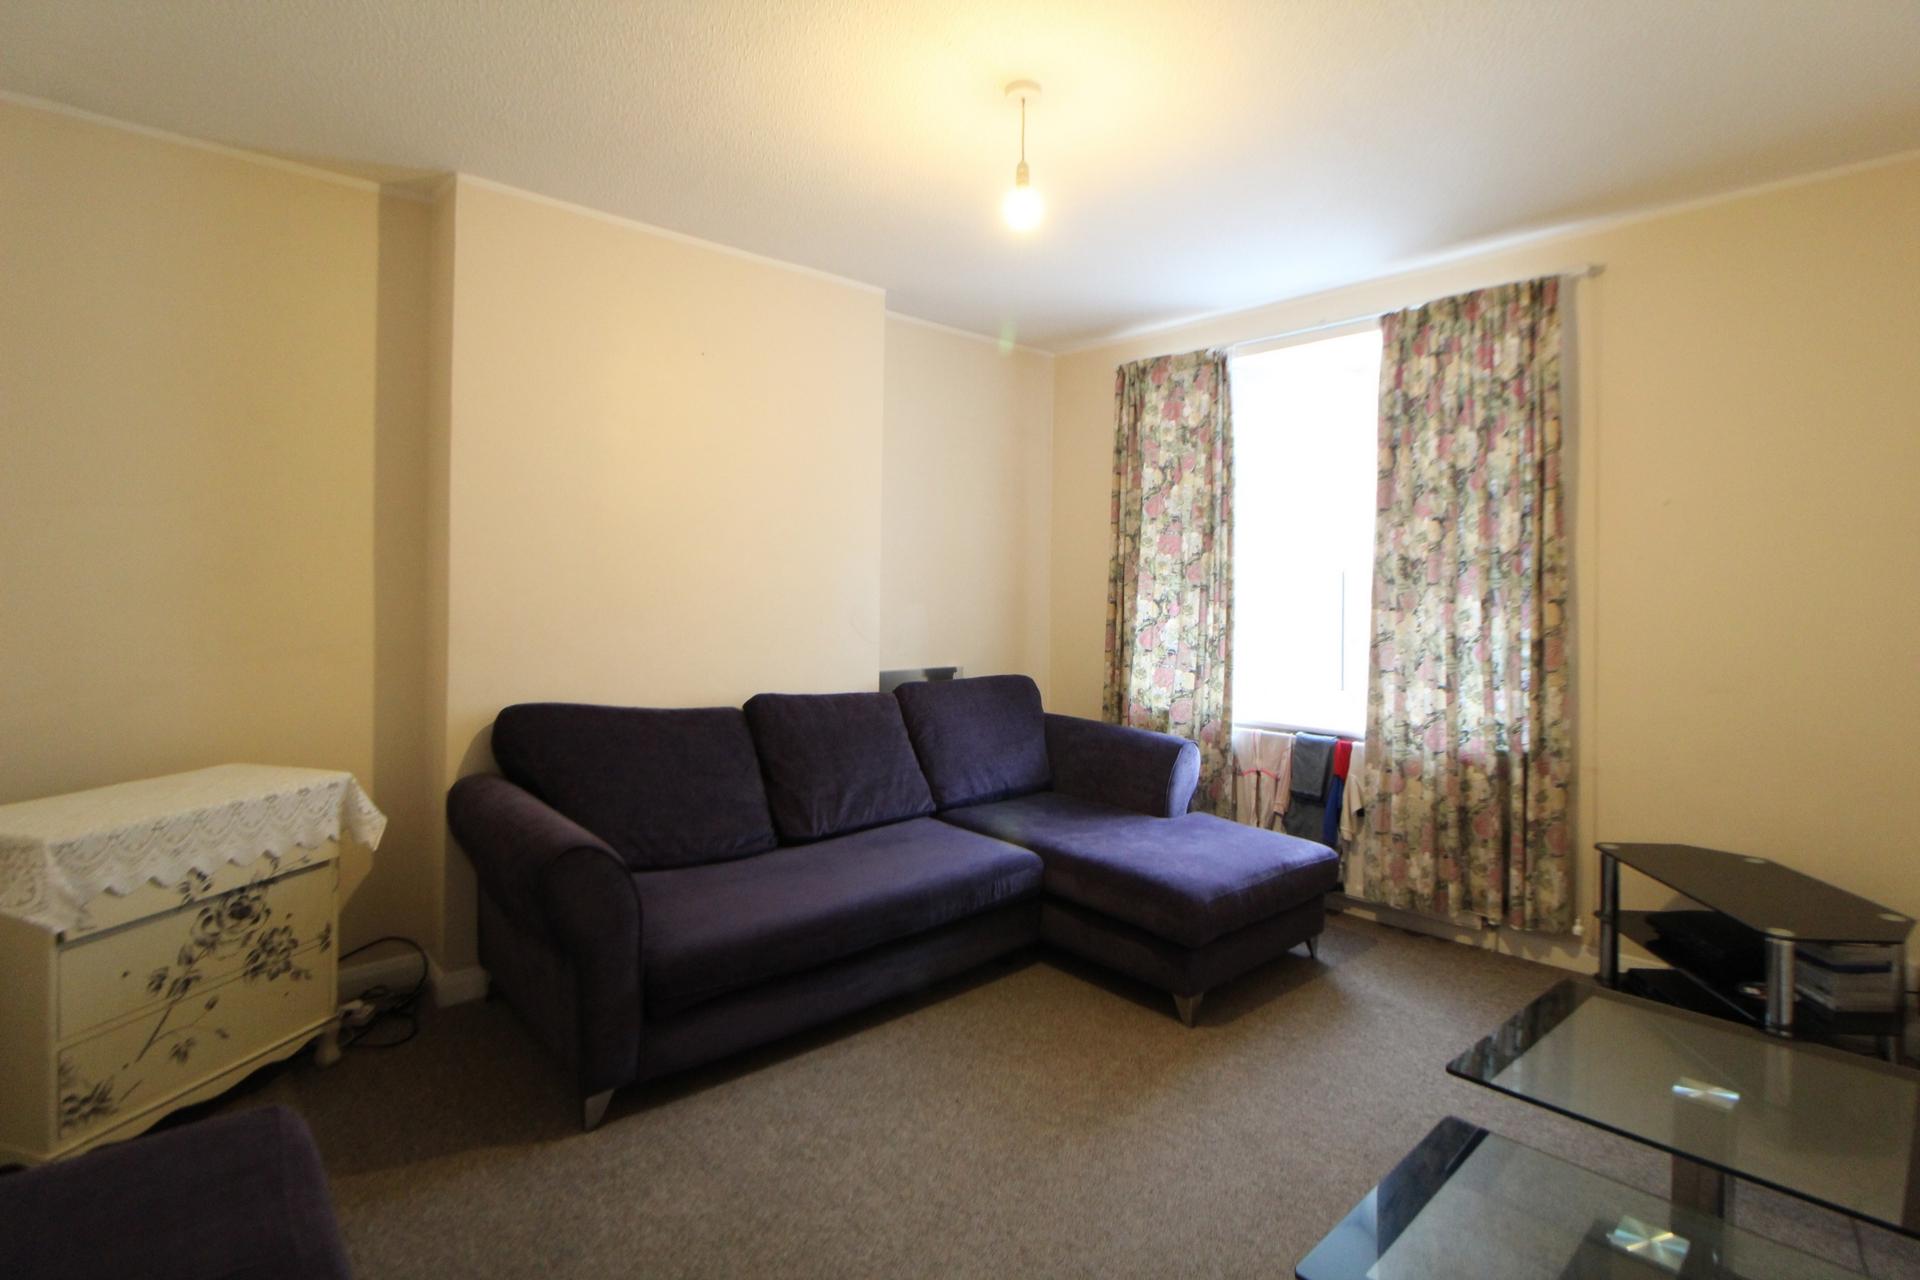 Property For Sale Luton Road Chatham Me4 3 Bedroom Conversion Through Linda Matthews